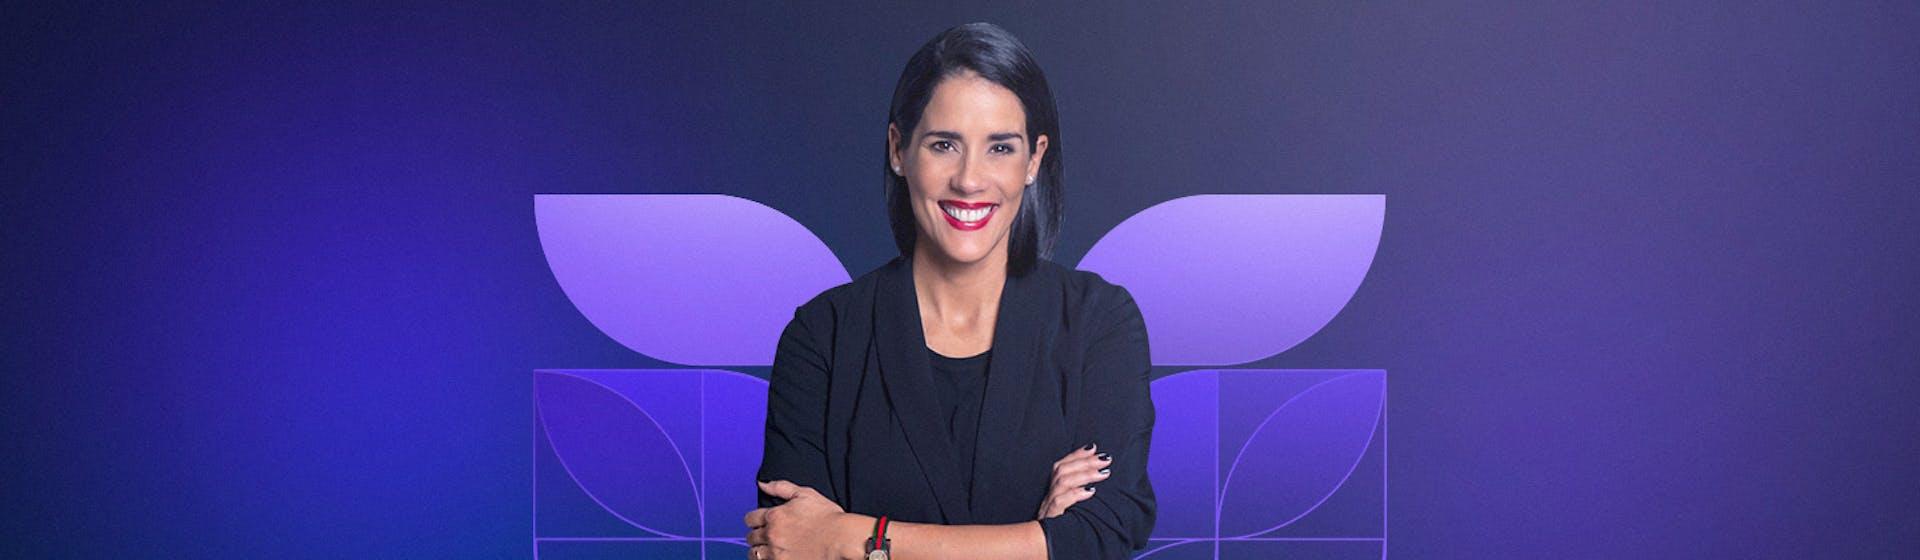 Gianella Neyra traspasa las pantallas con su curso de actuación en Crehana